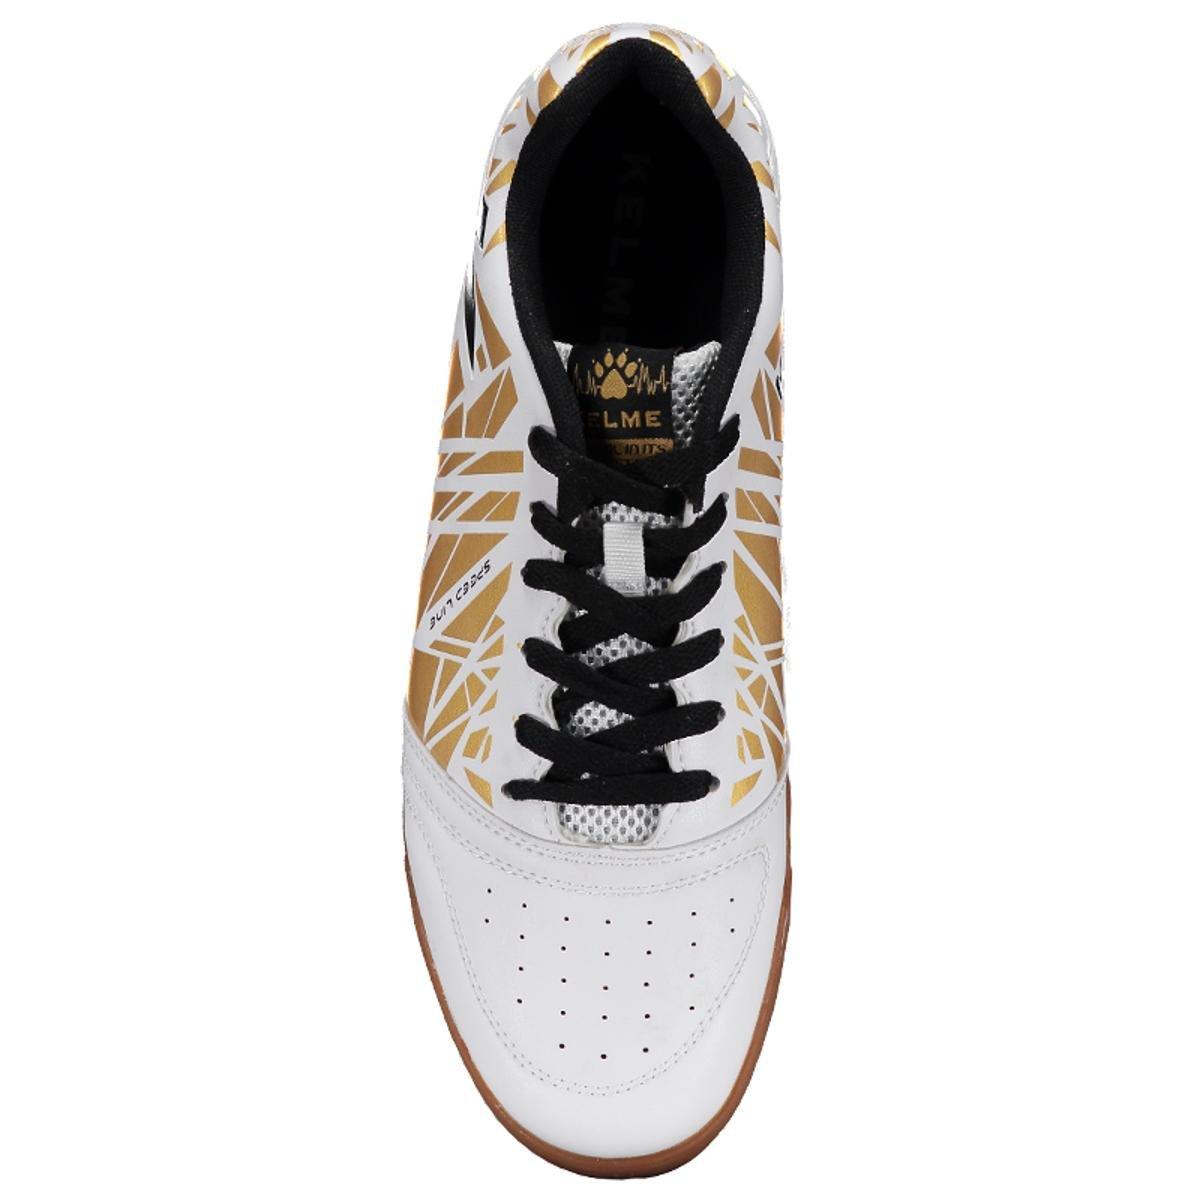 Chuteira Futsal Kelme Subito Masculina - Compre Agora  46dc5a6bcefc5